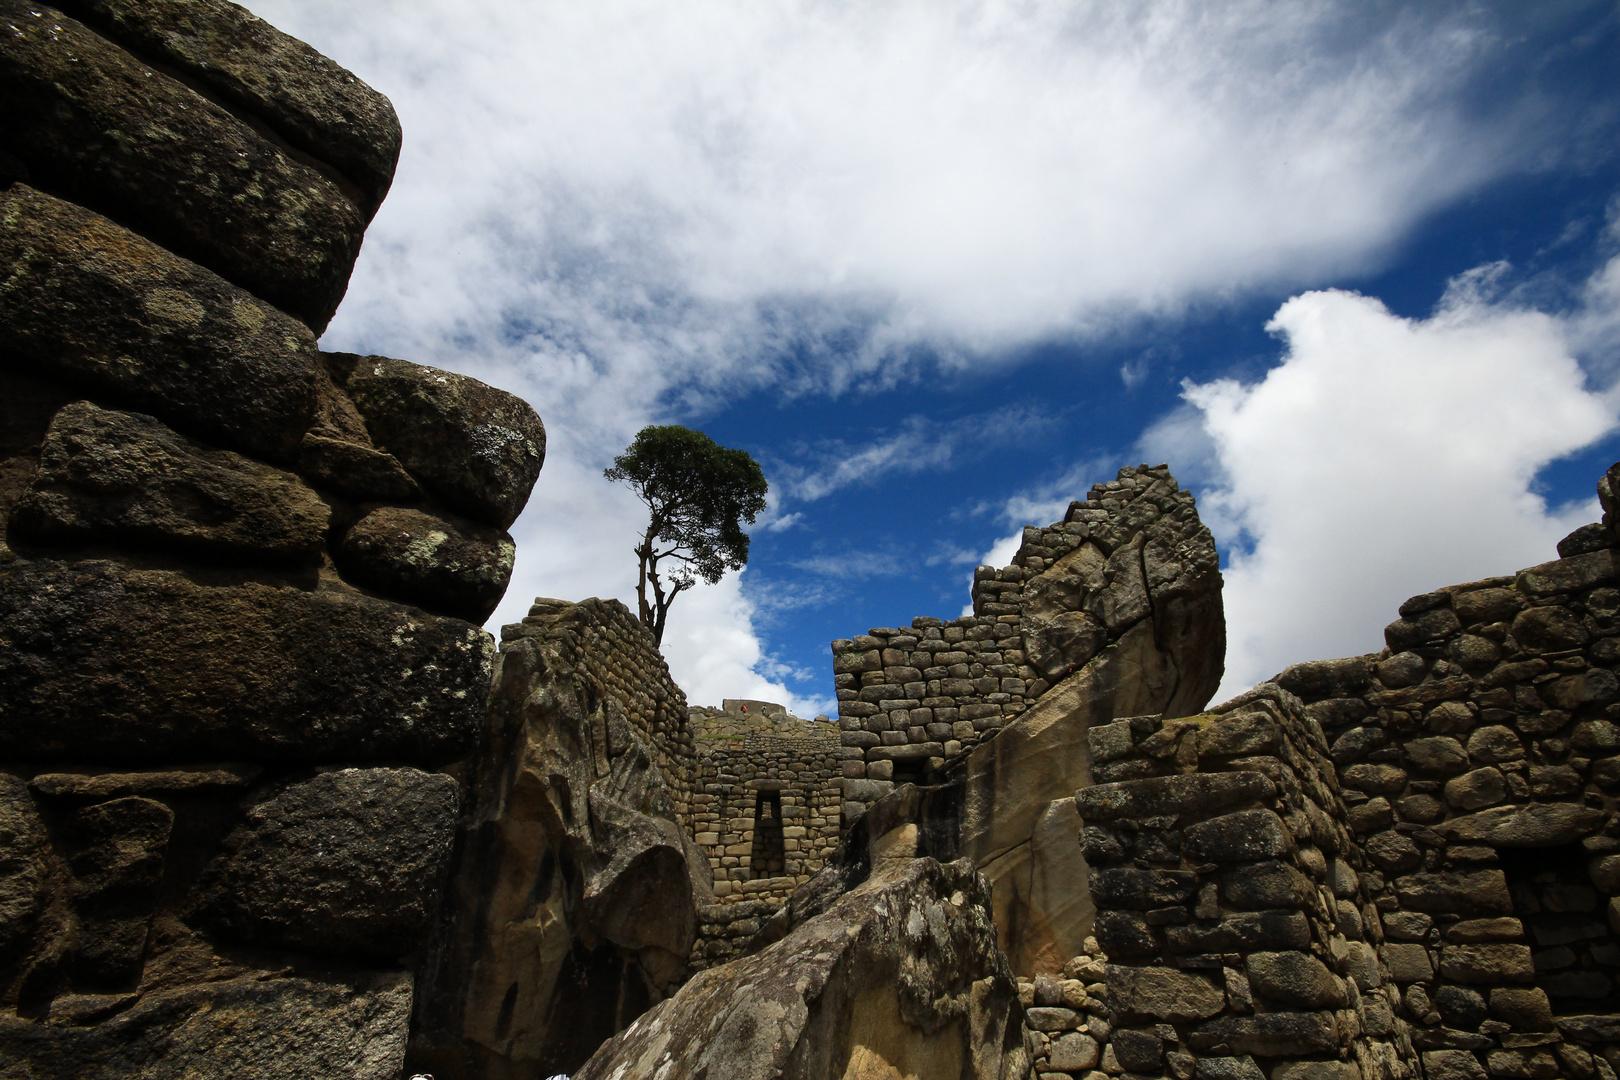 Machu Picchu mal anders